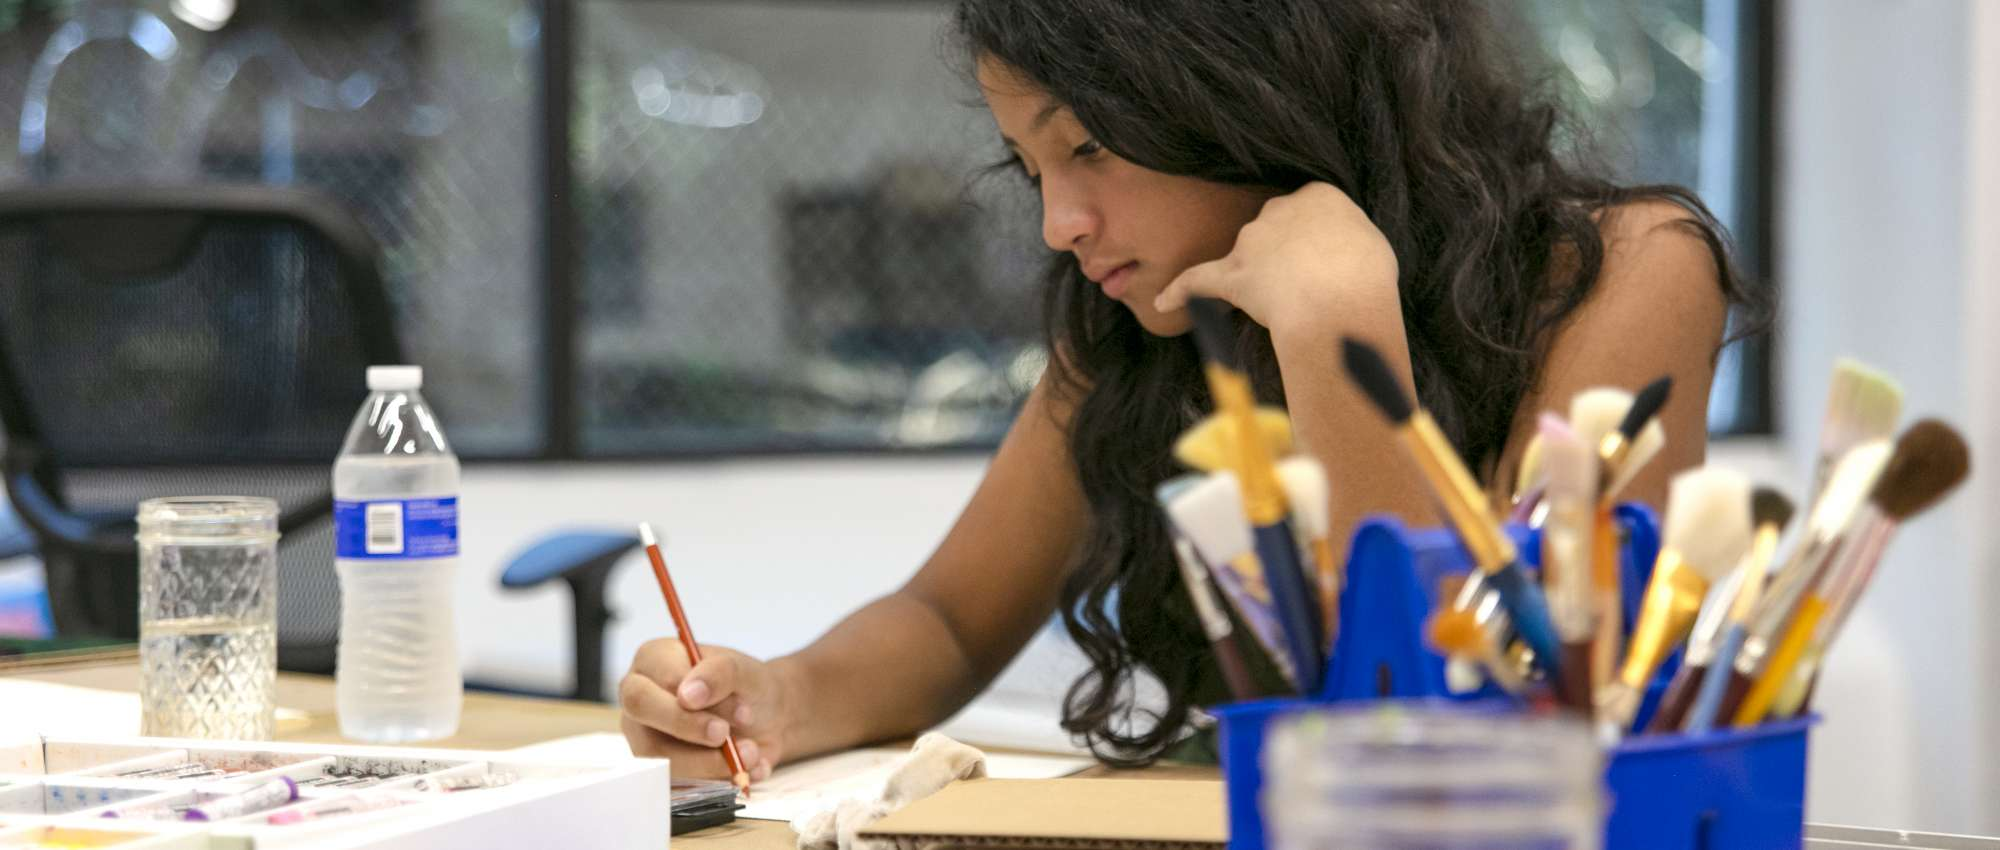 Fresh Artists: fueling creativity